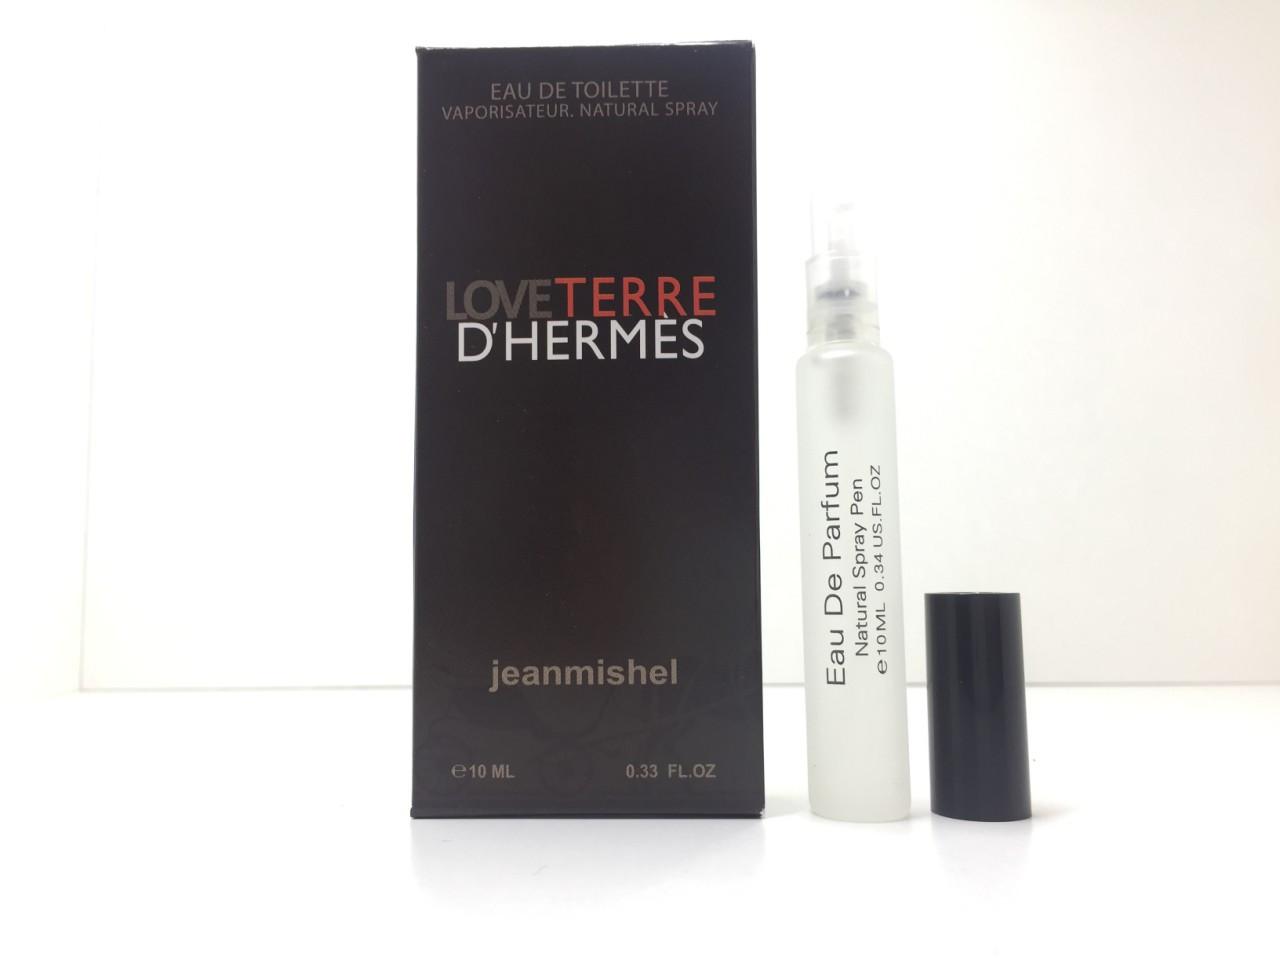 Мини парфюм мужской Jeanmishel Terre d'Hermes (Жанмишель Терре Гермес) 10 мл